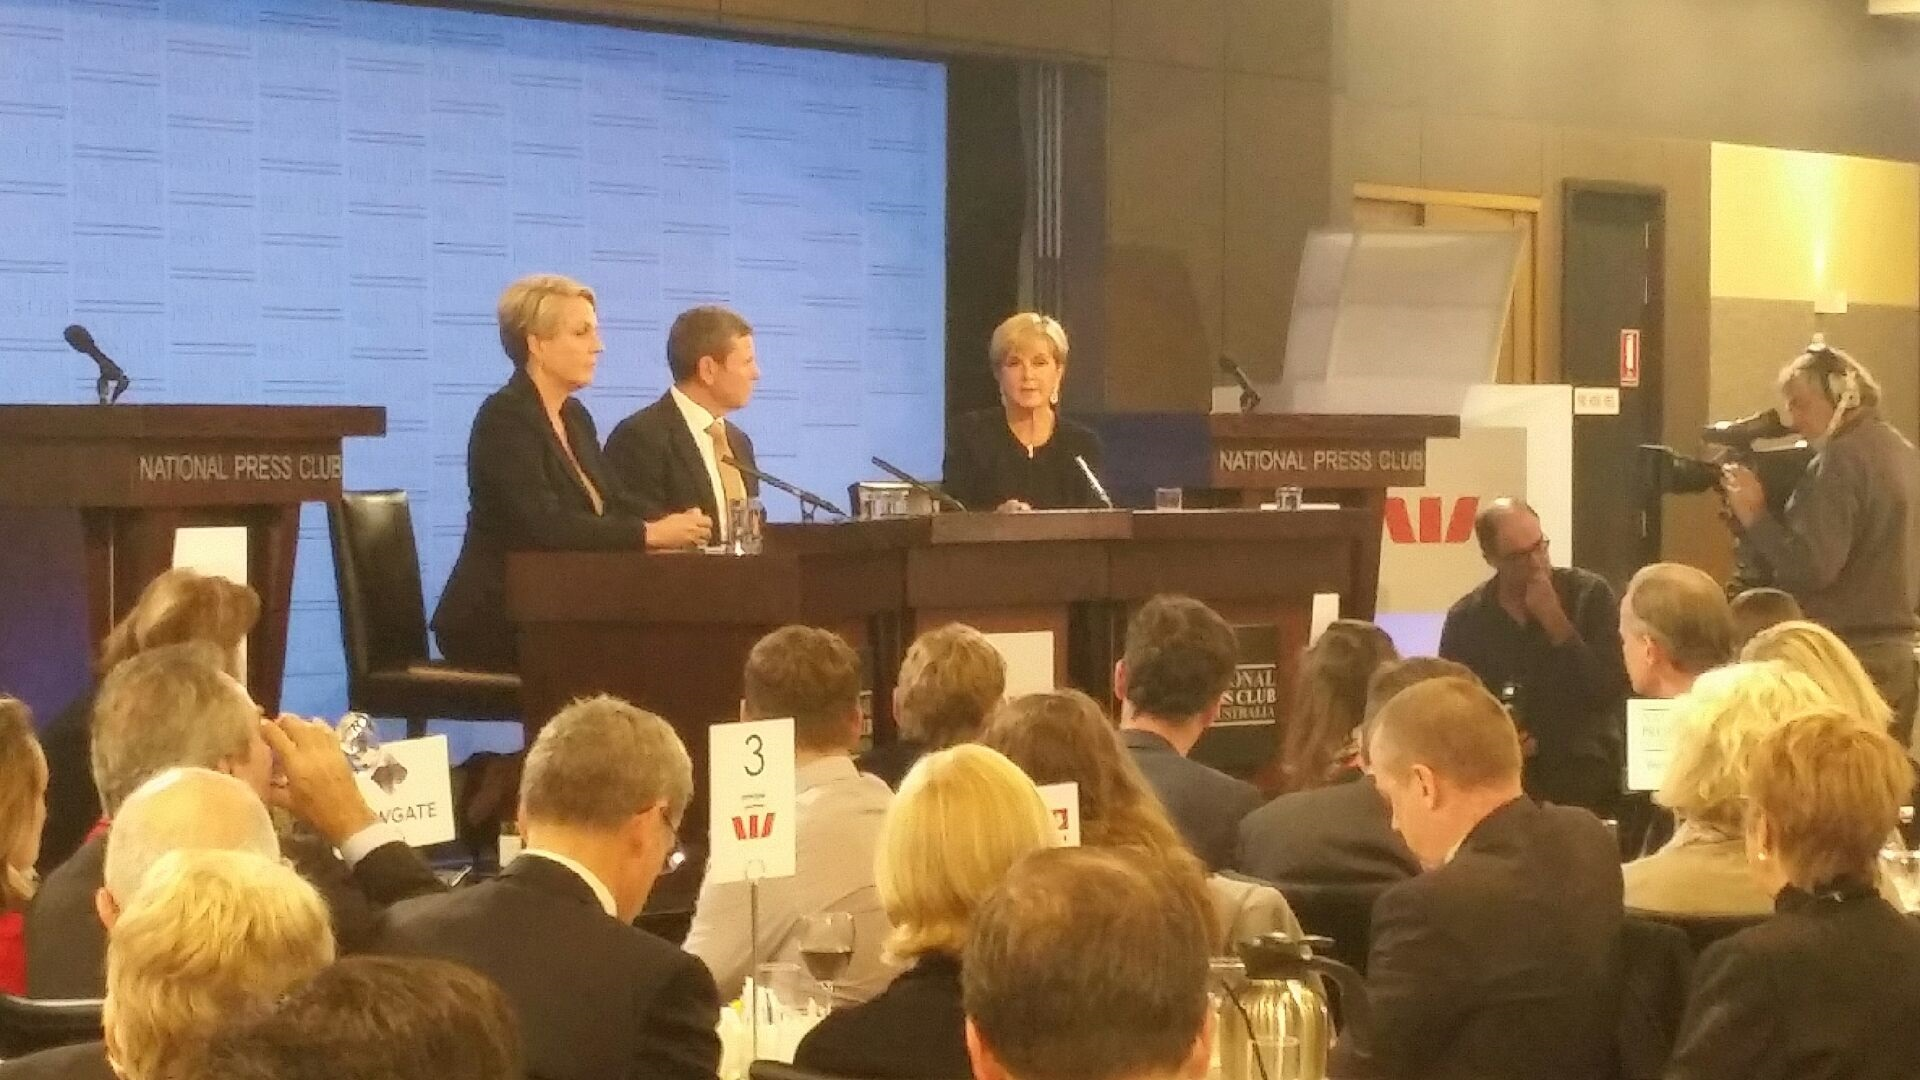 Deputy Leaders Debate, 21 June 2016 (image: Matthew Dornan)